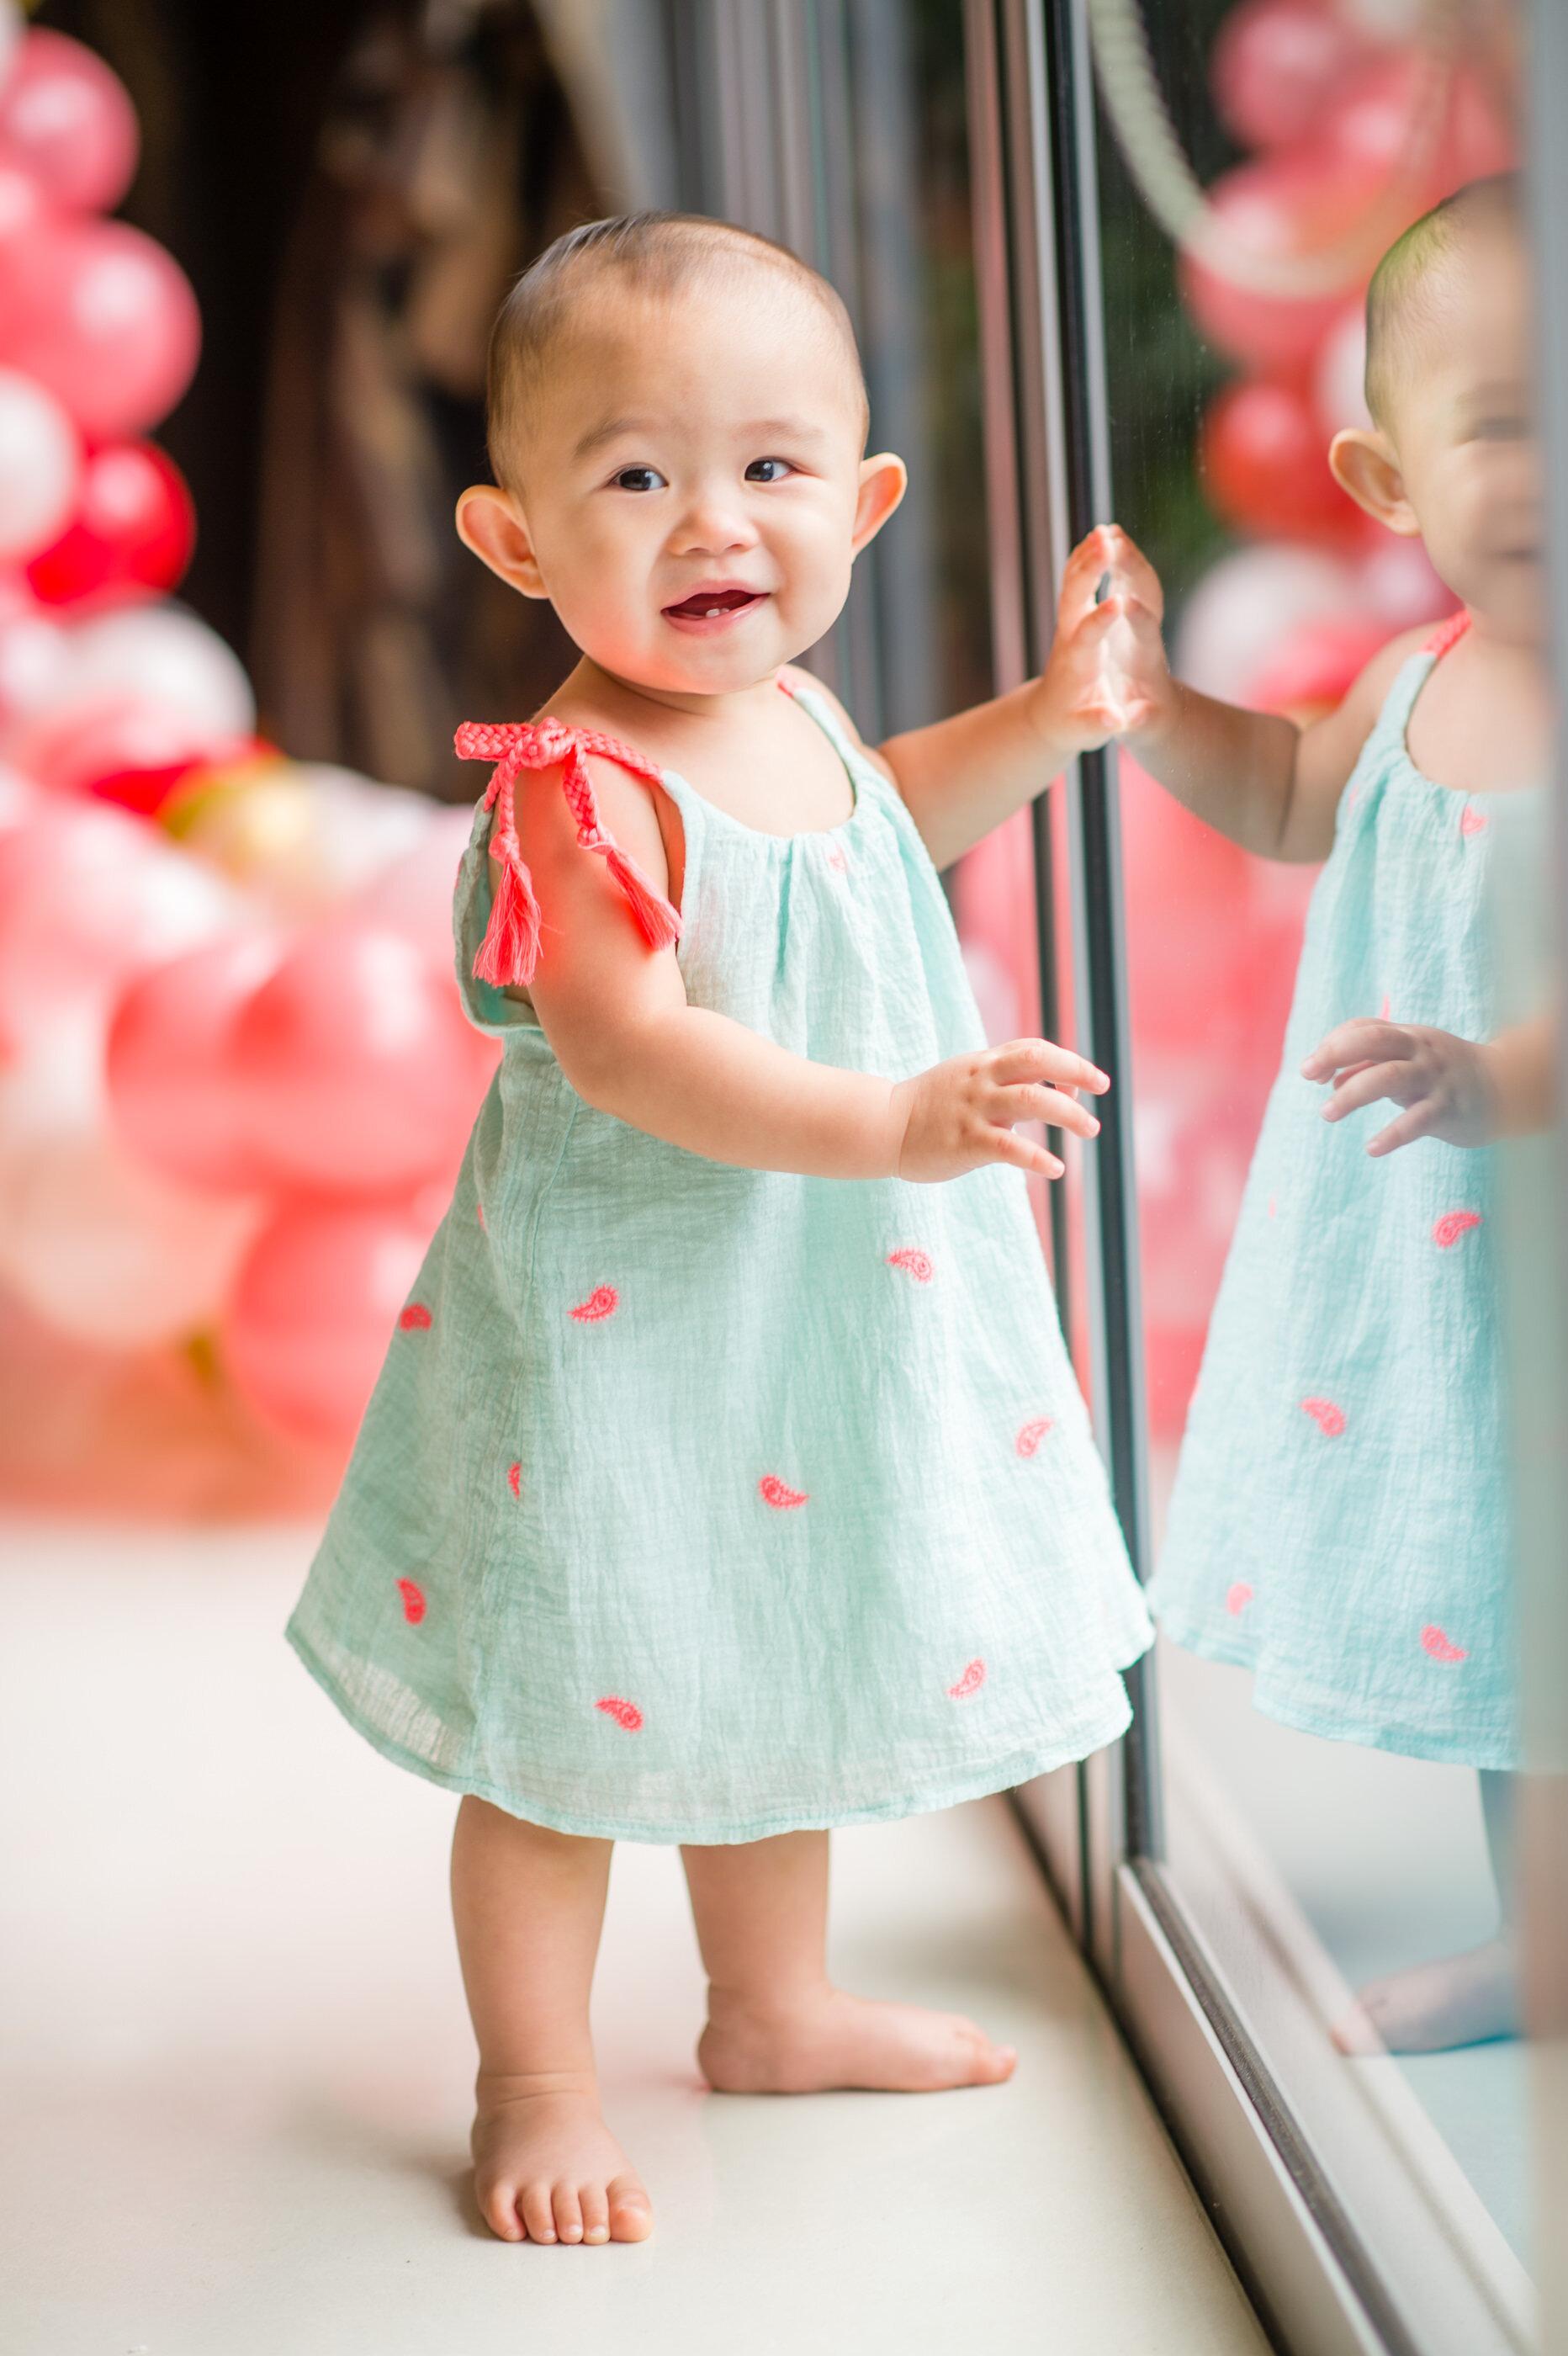 Birthday girl SG